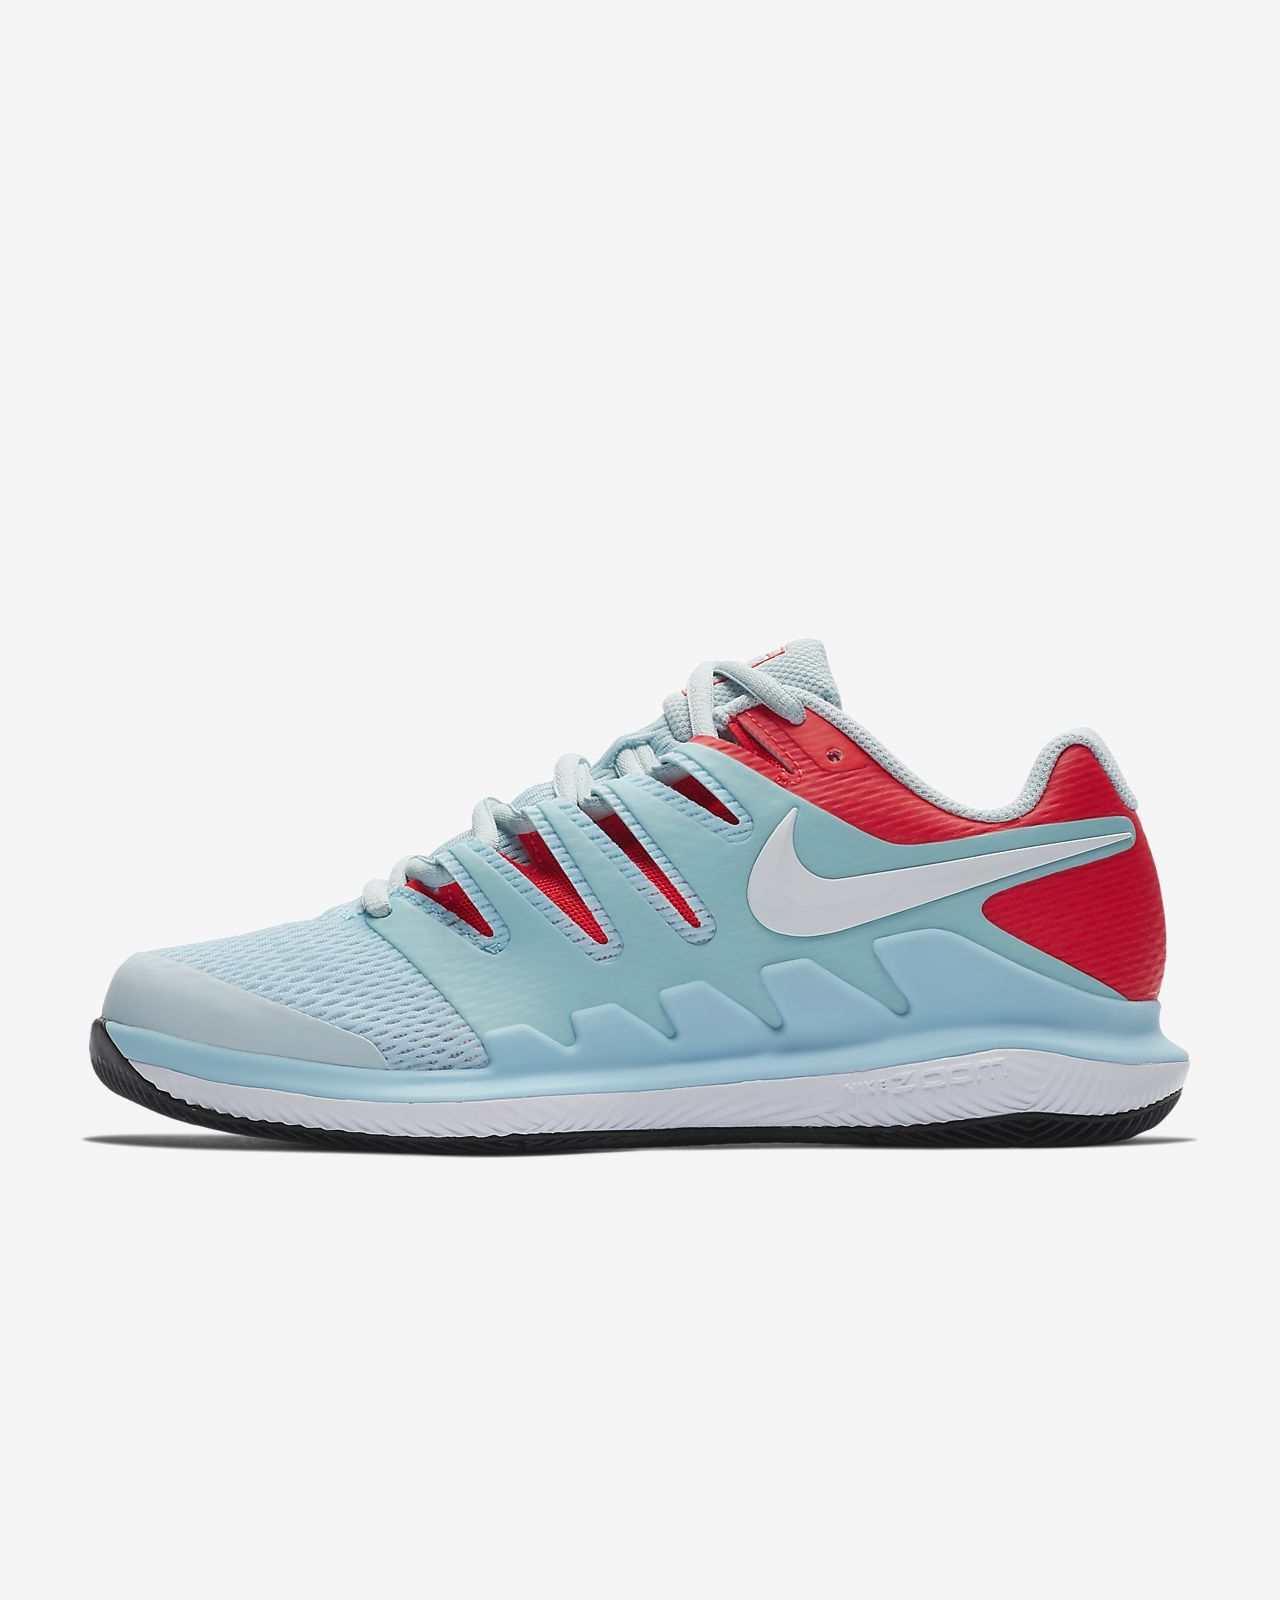 8b58fe441efd NikeCourt Air Zoom Vapor X Hardcourt tennisschoen voor dames. Nike ...